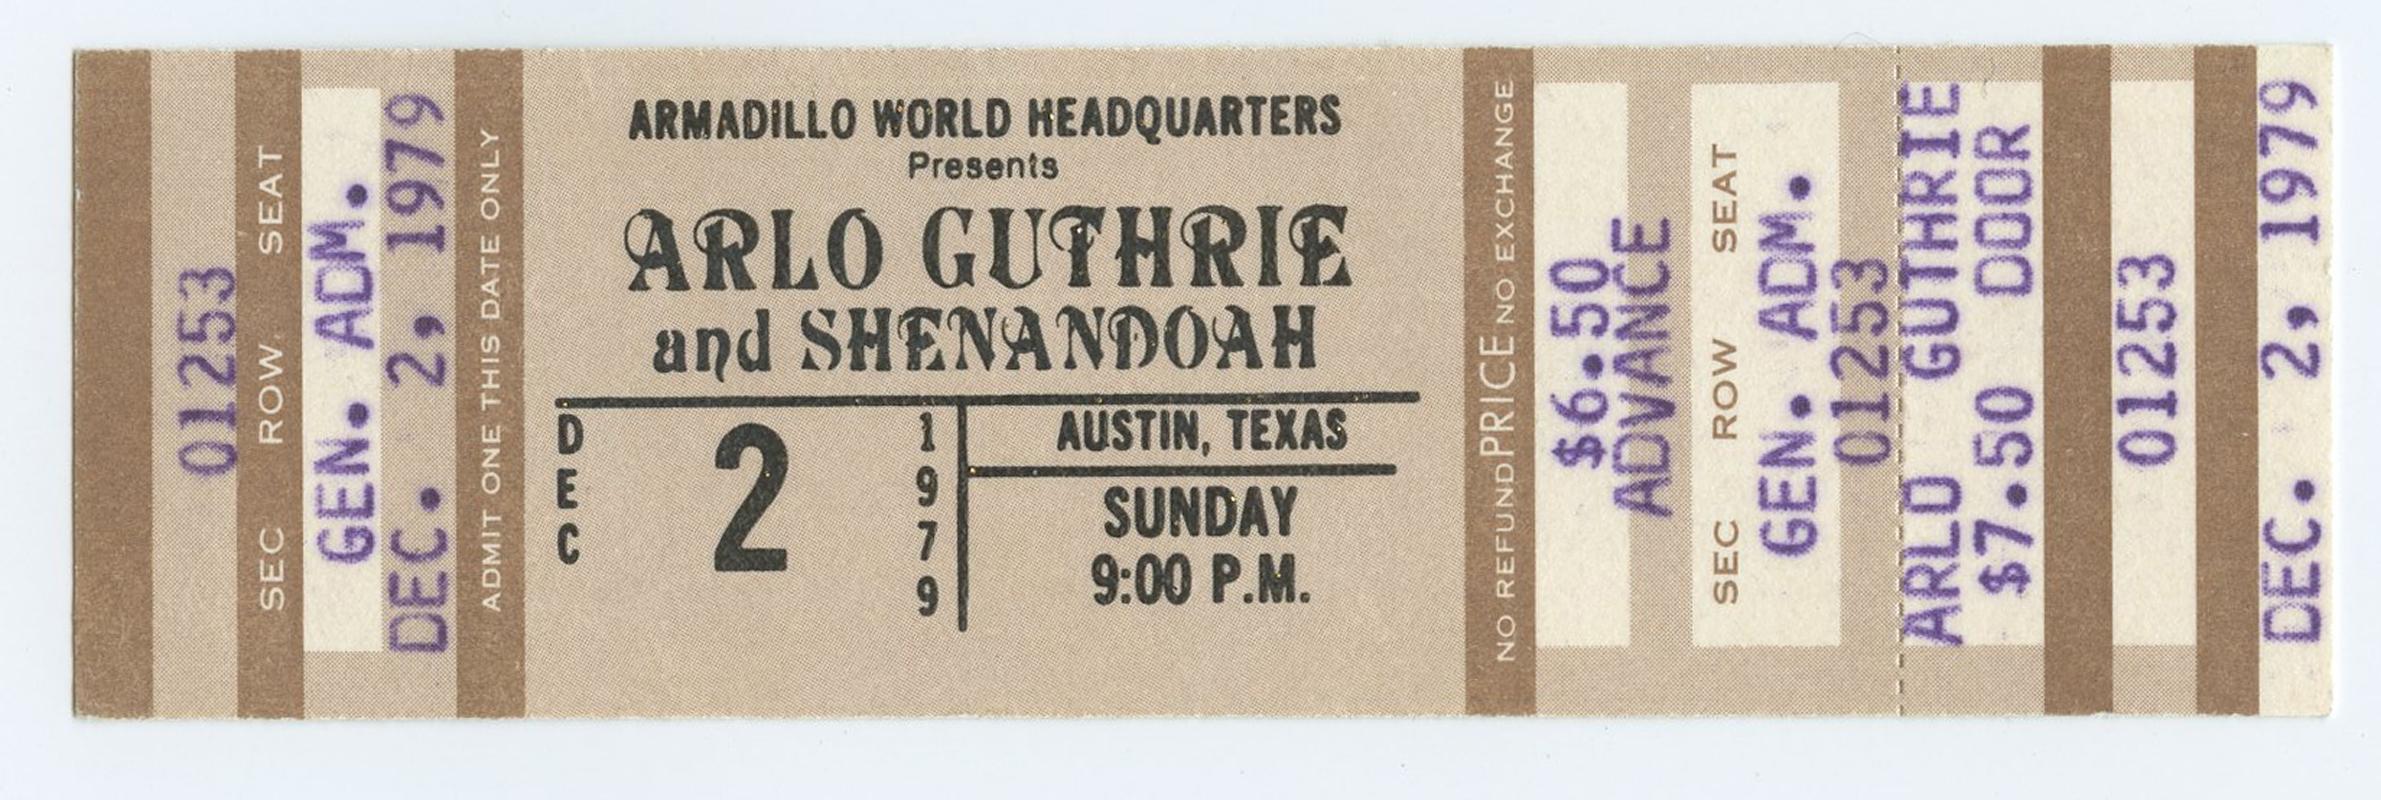 Arlo Guthrie Ticket 1979 Dec 2 Austin TX Unused